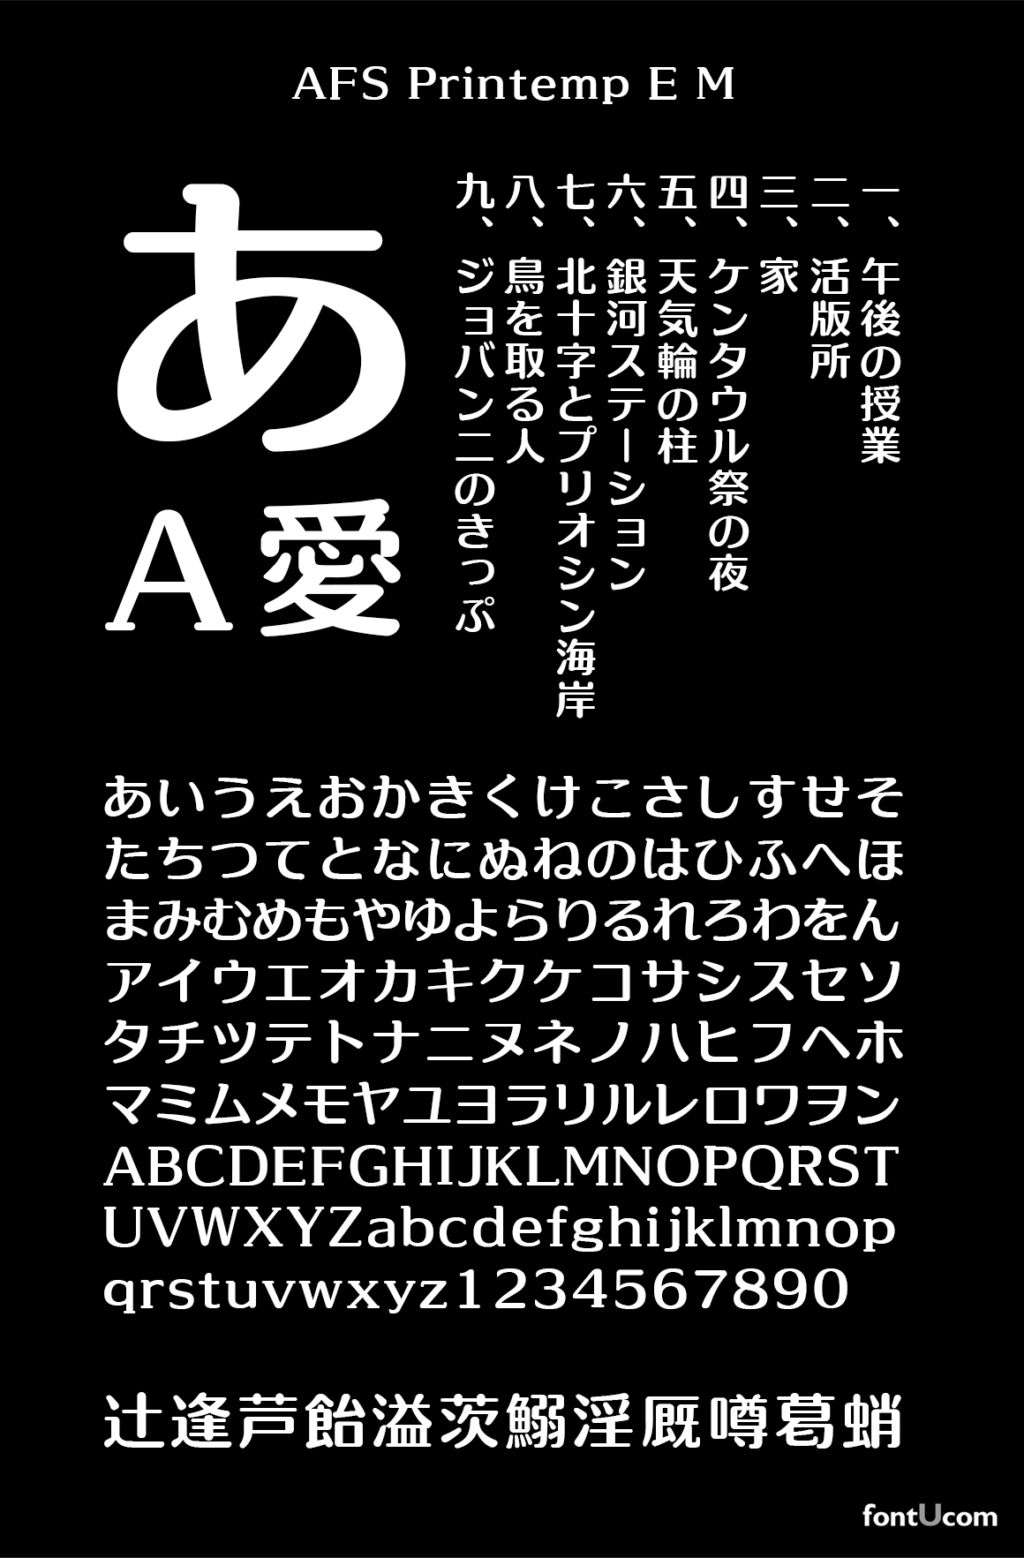 AFS Printemps E_M